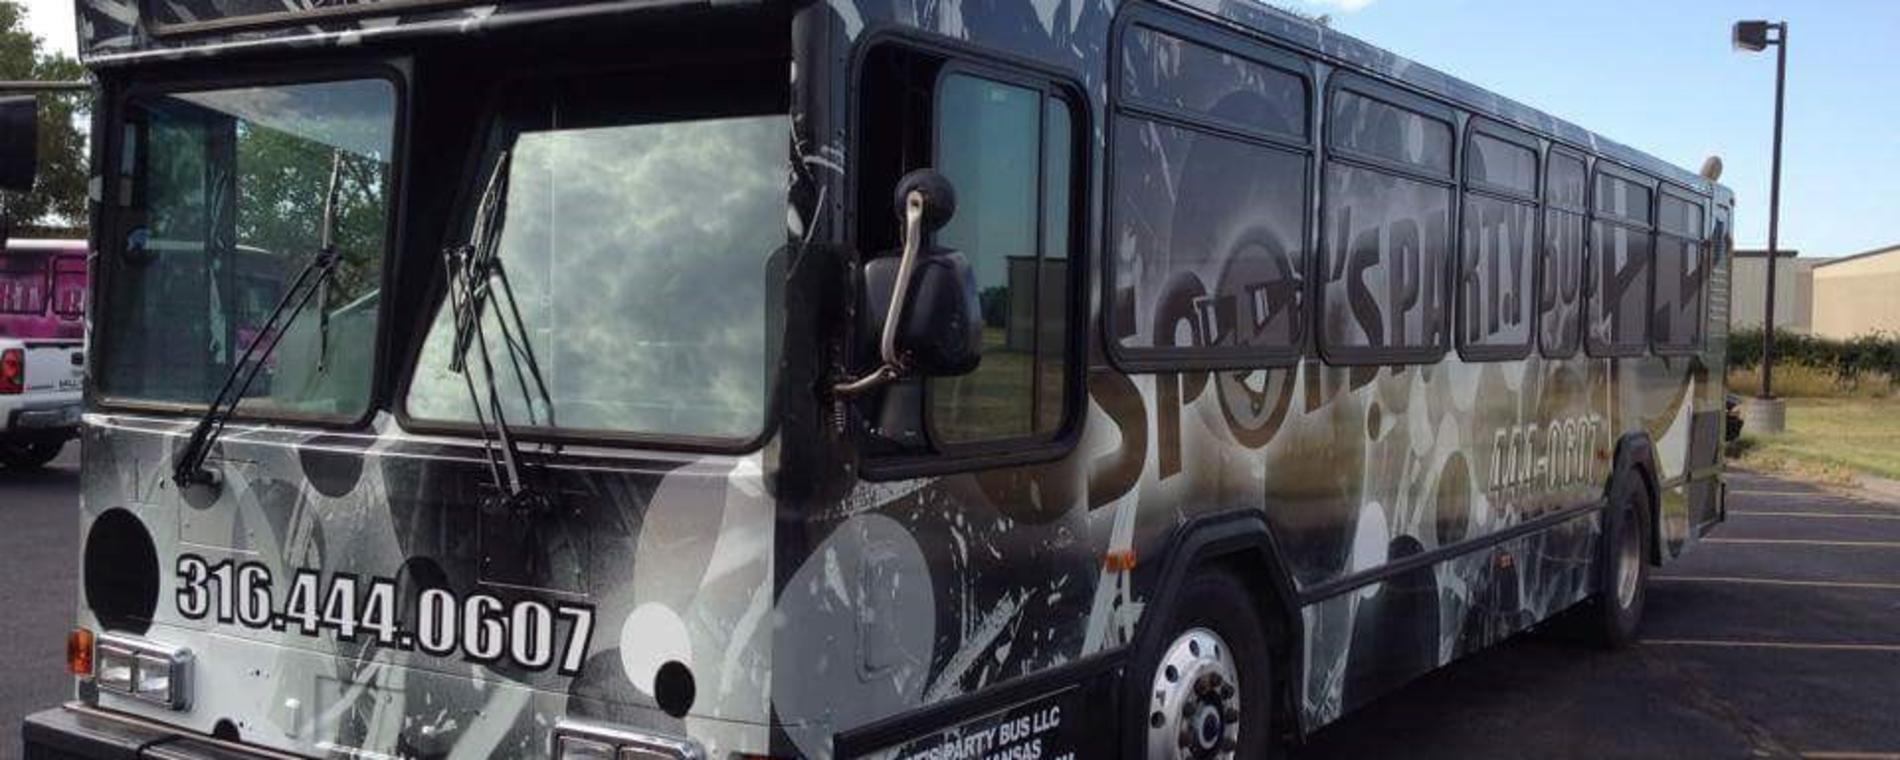 Spot's Party Bus Vehicle Visit Wichita